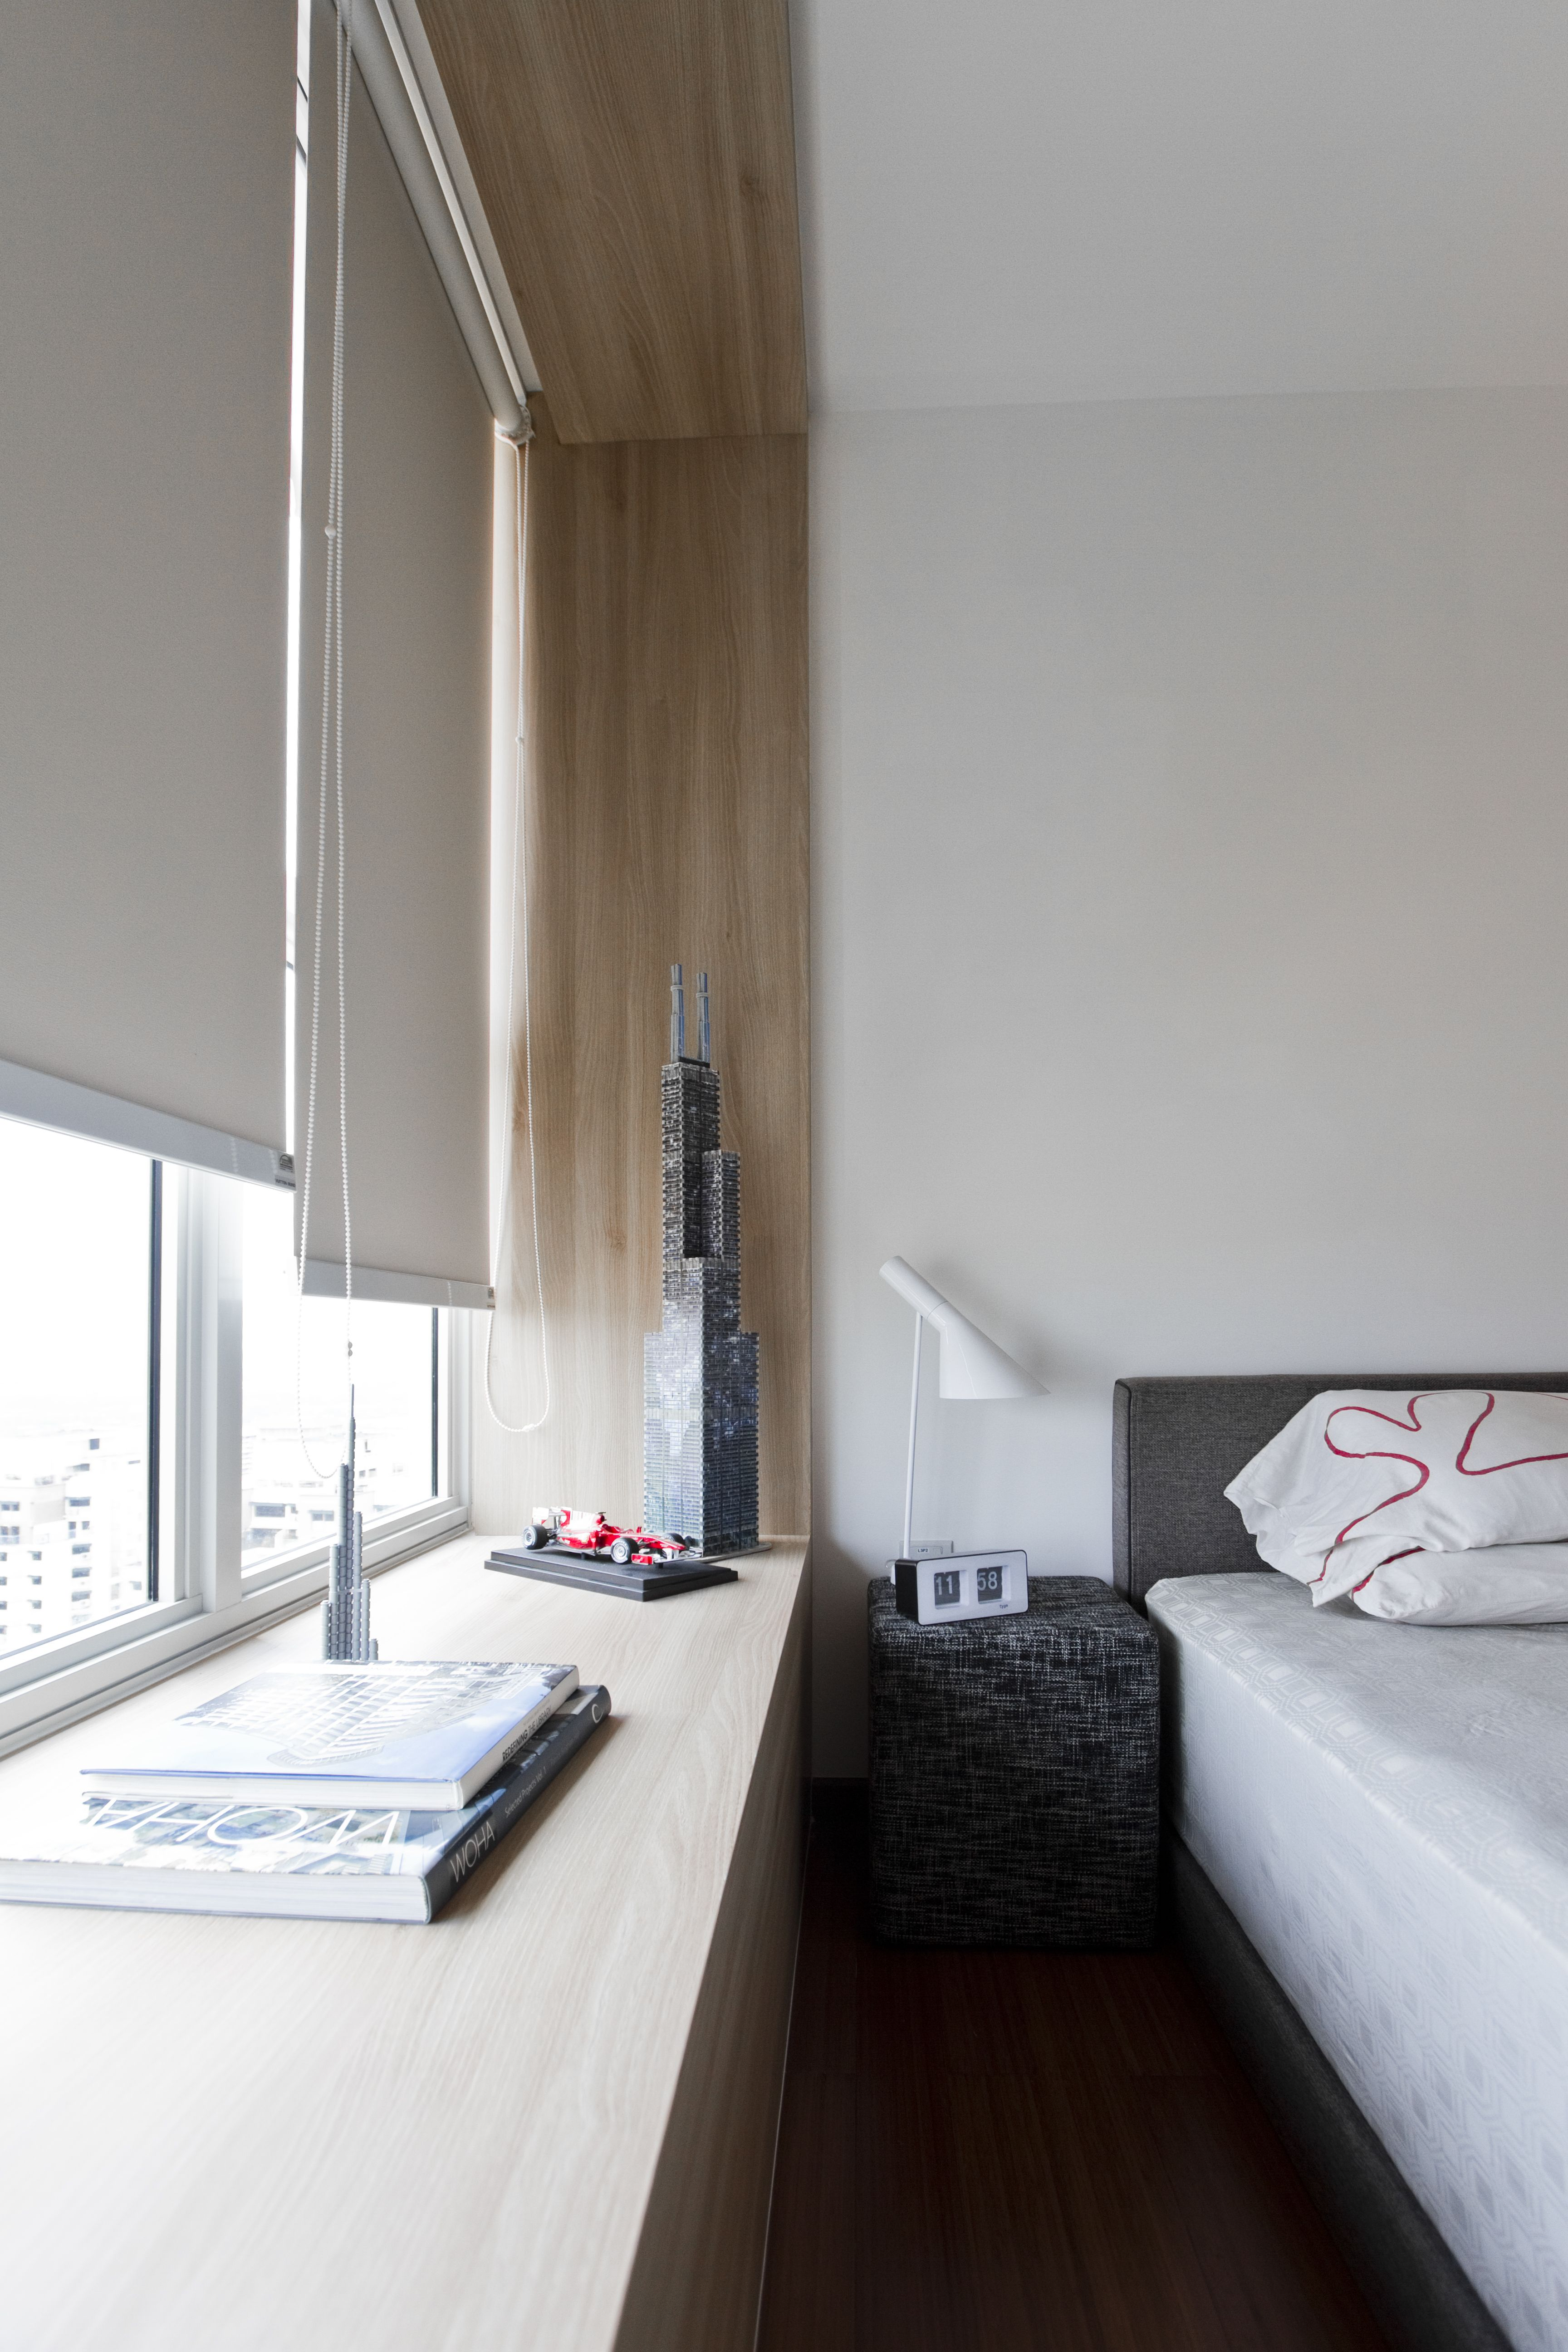 Spacesaving ideas for bay windows Singapore Window and Bay windows